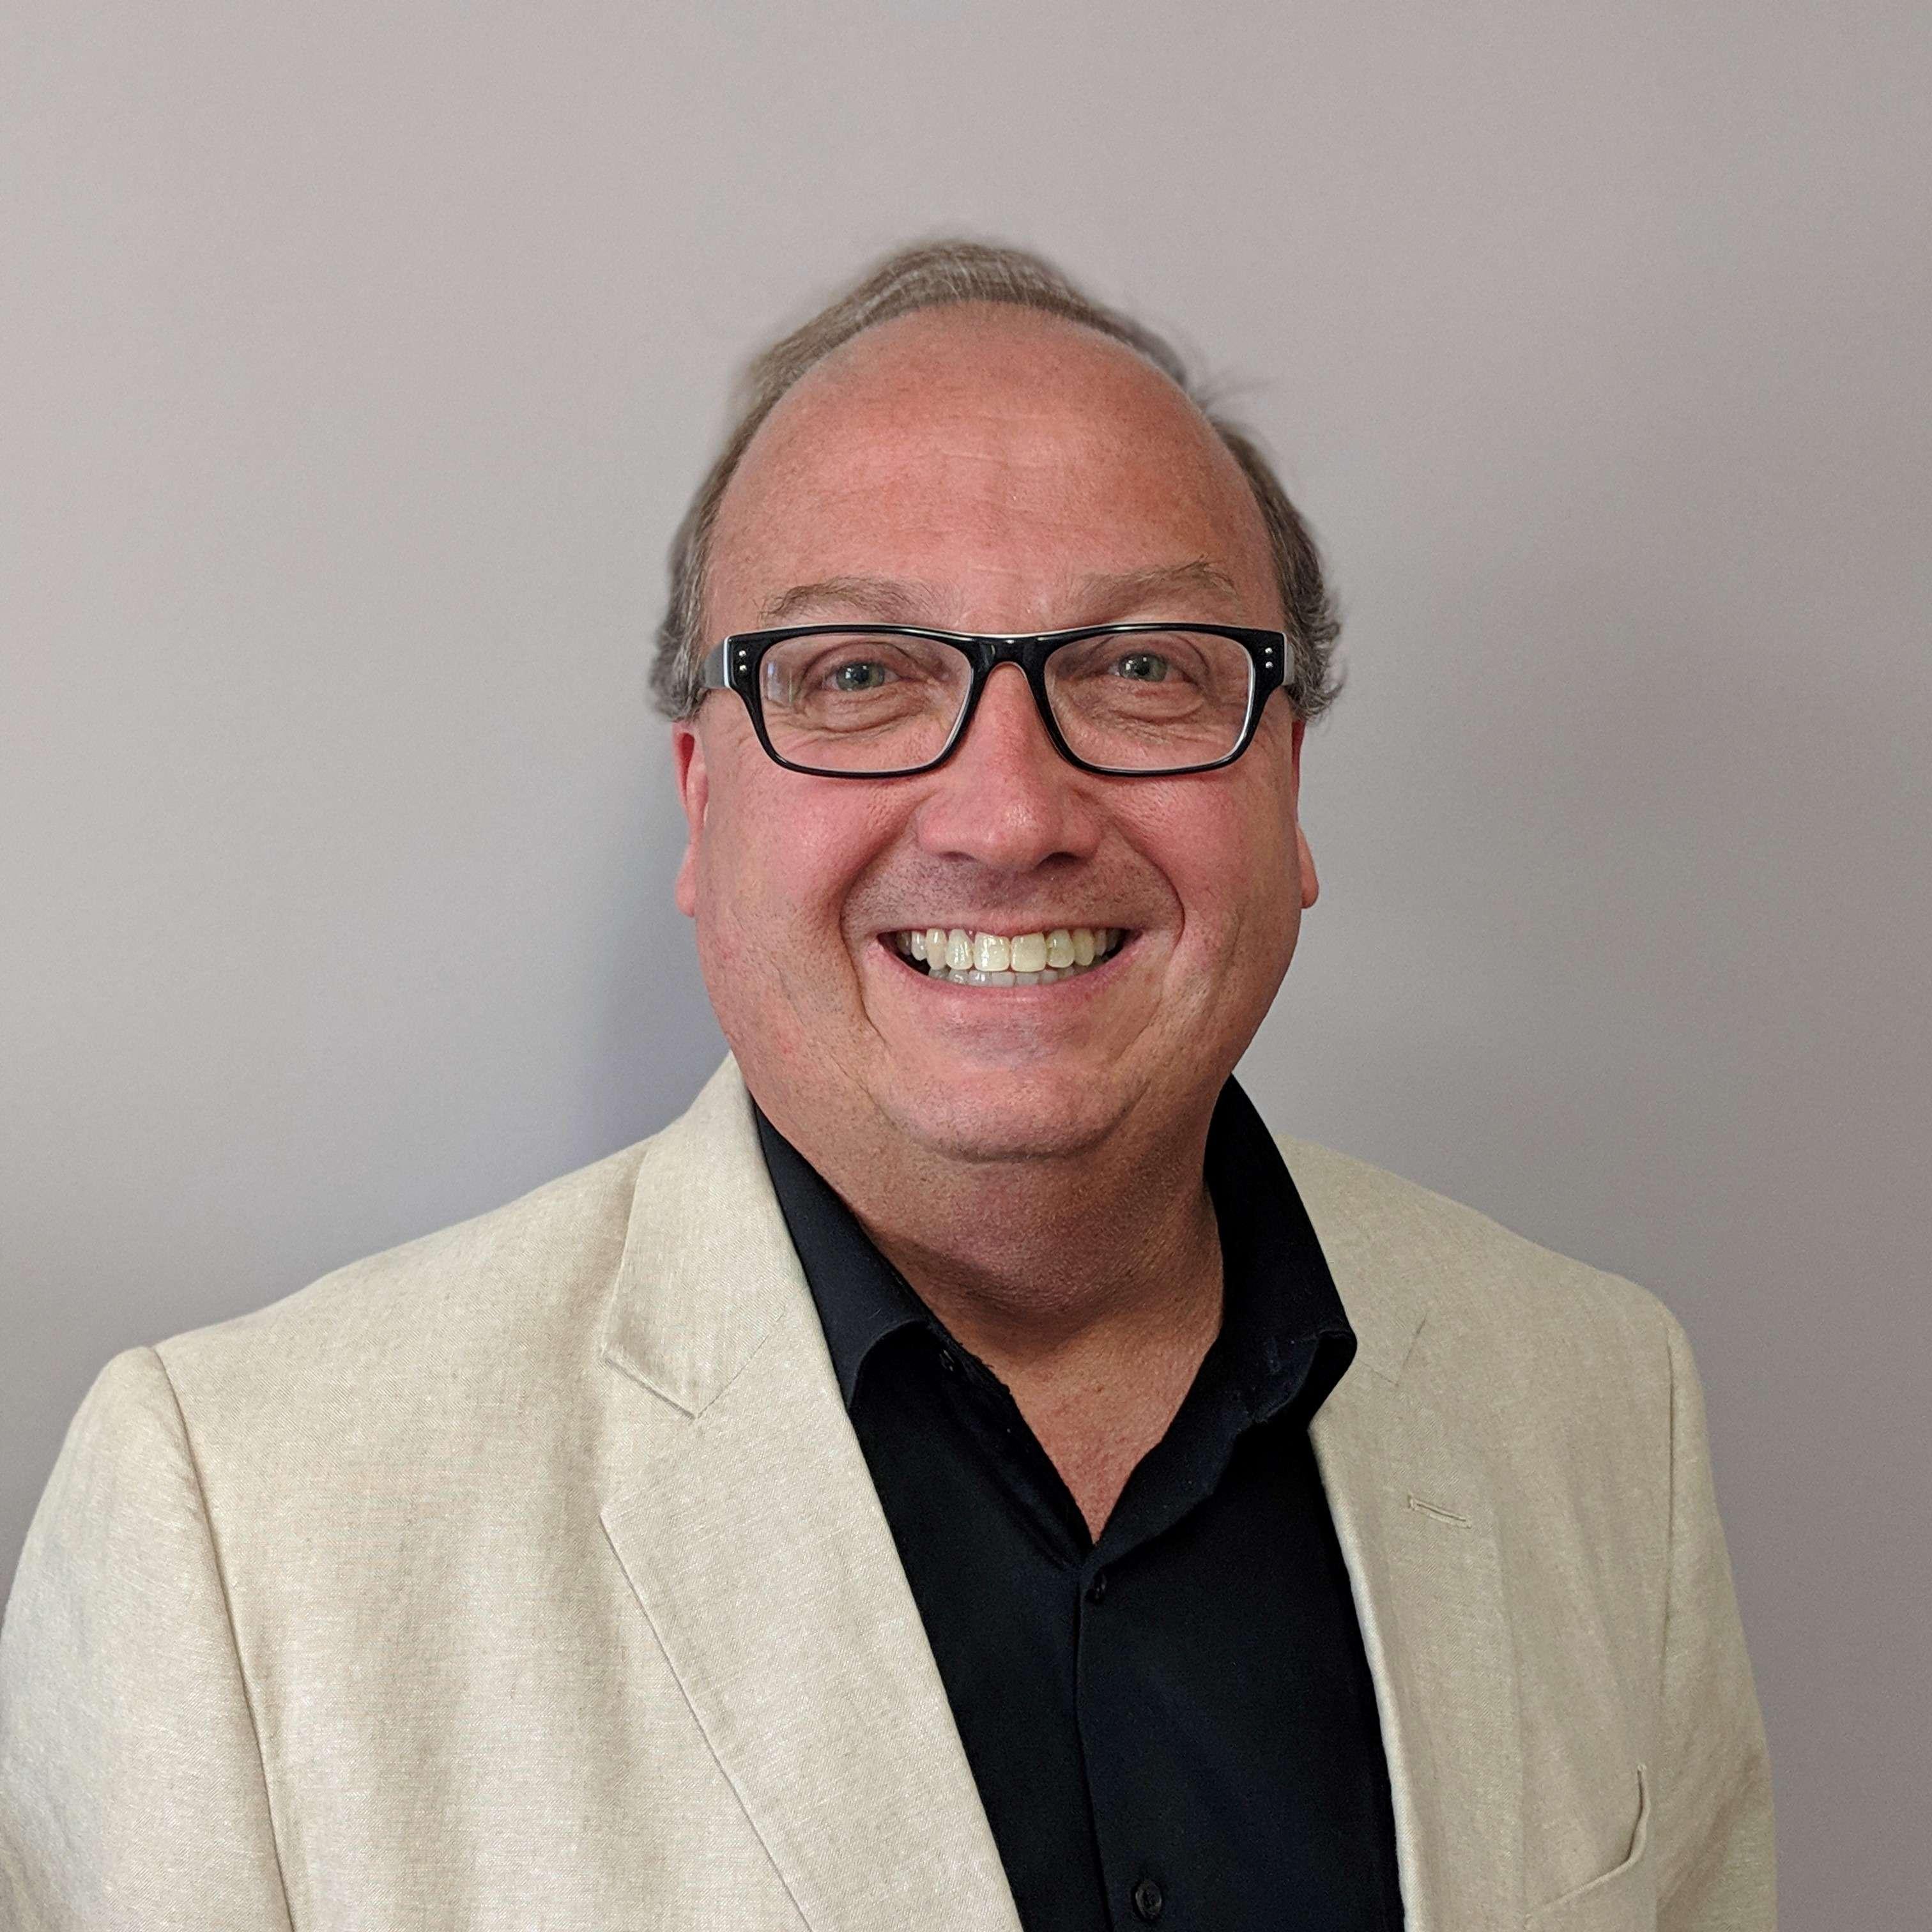 Jim Tancredi